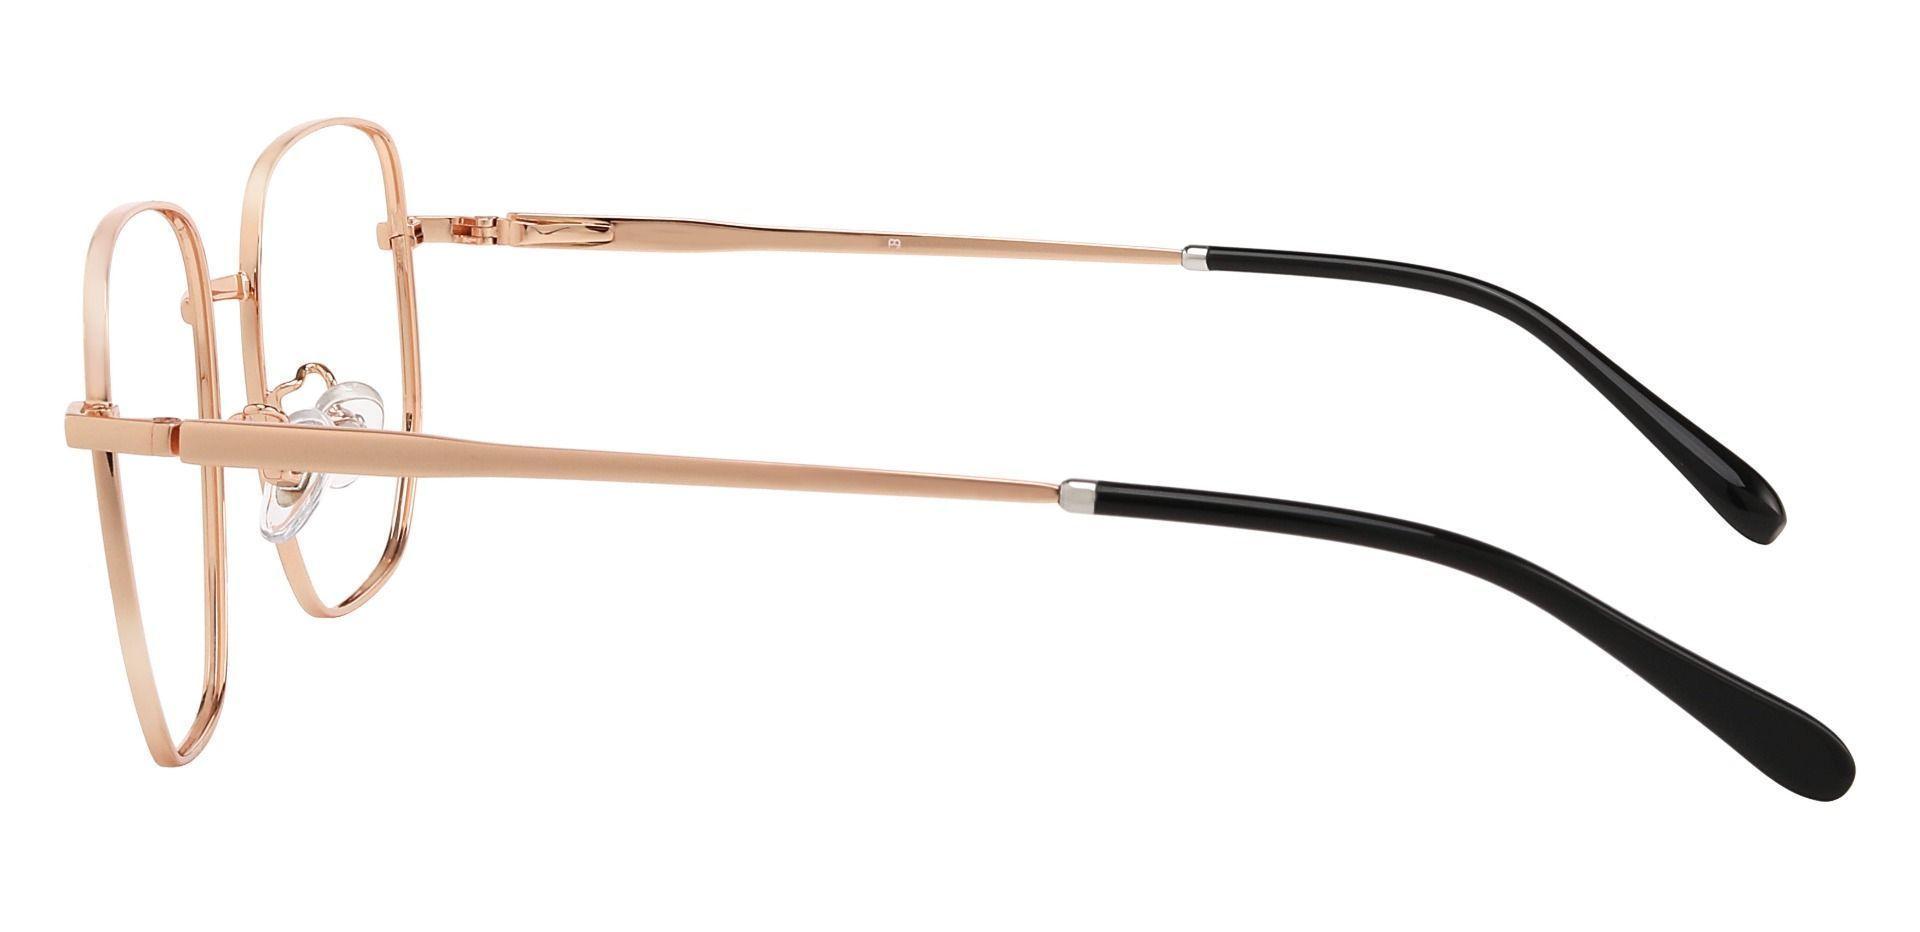 Swayze Geometric Prescription Glasses - Gold